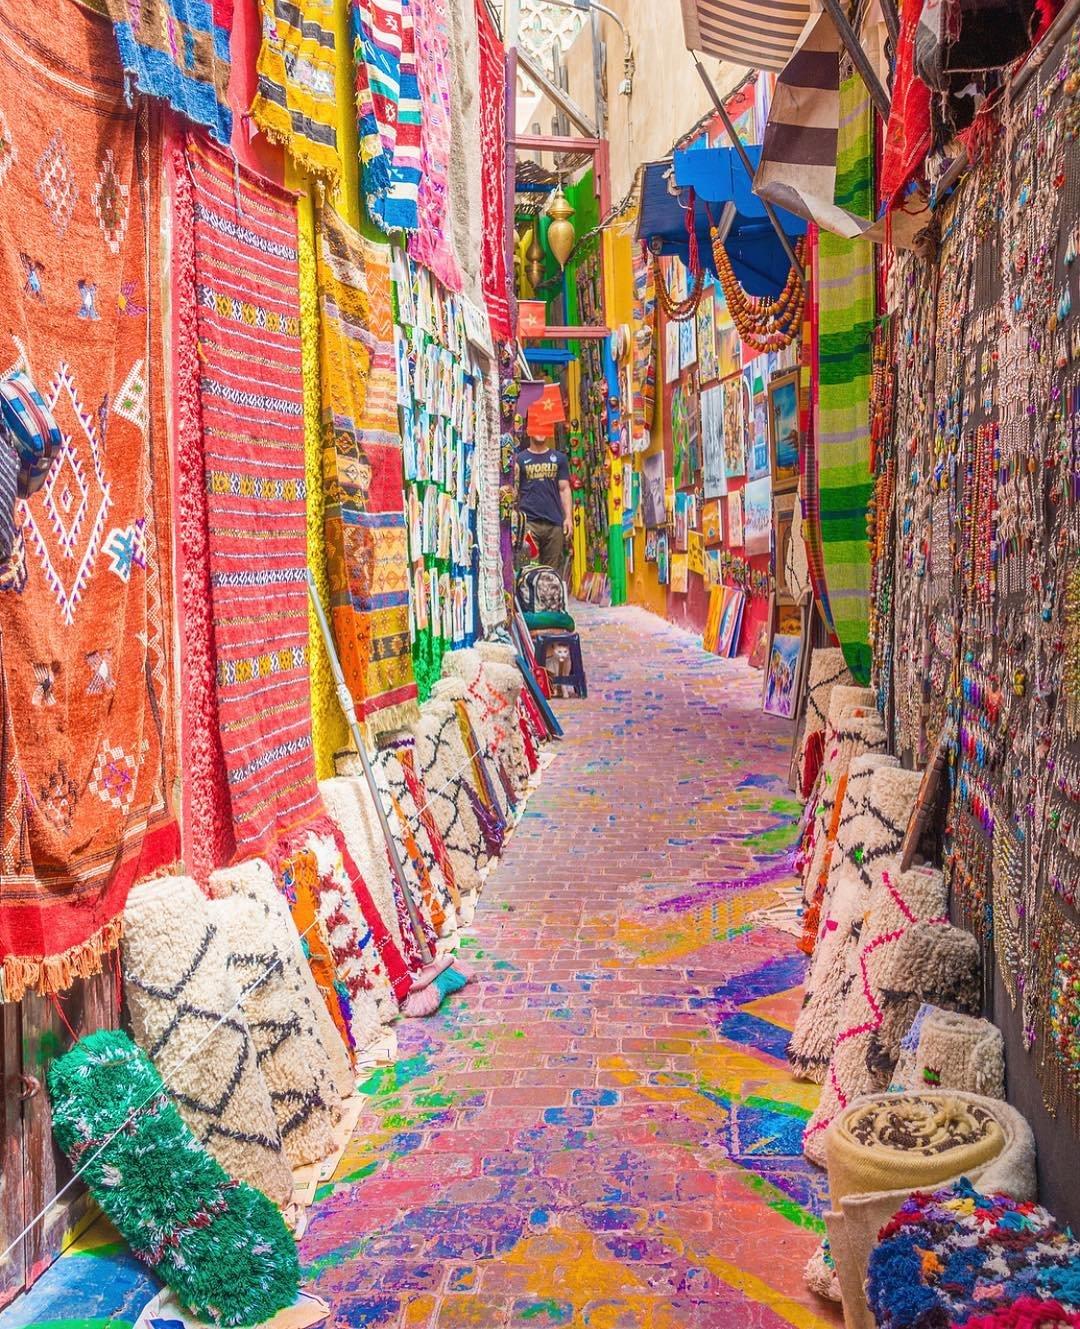 fes, casablanca tours, morocco tour, casablanca to sahara desert, morocco tours , 9 days